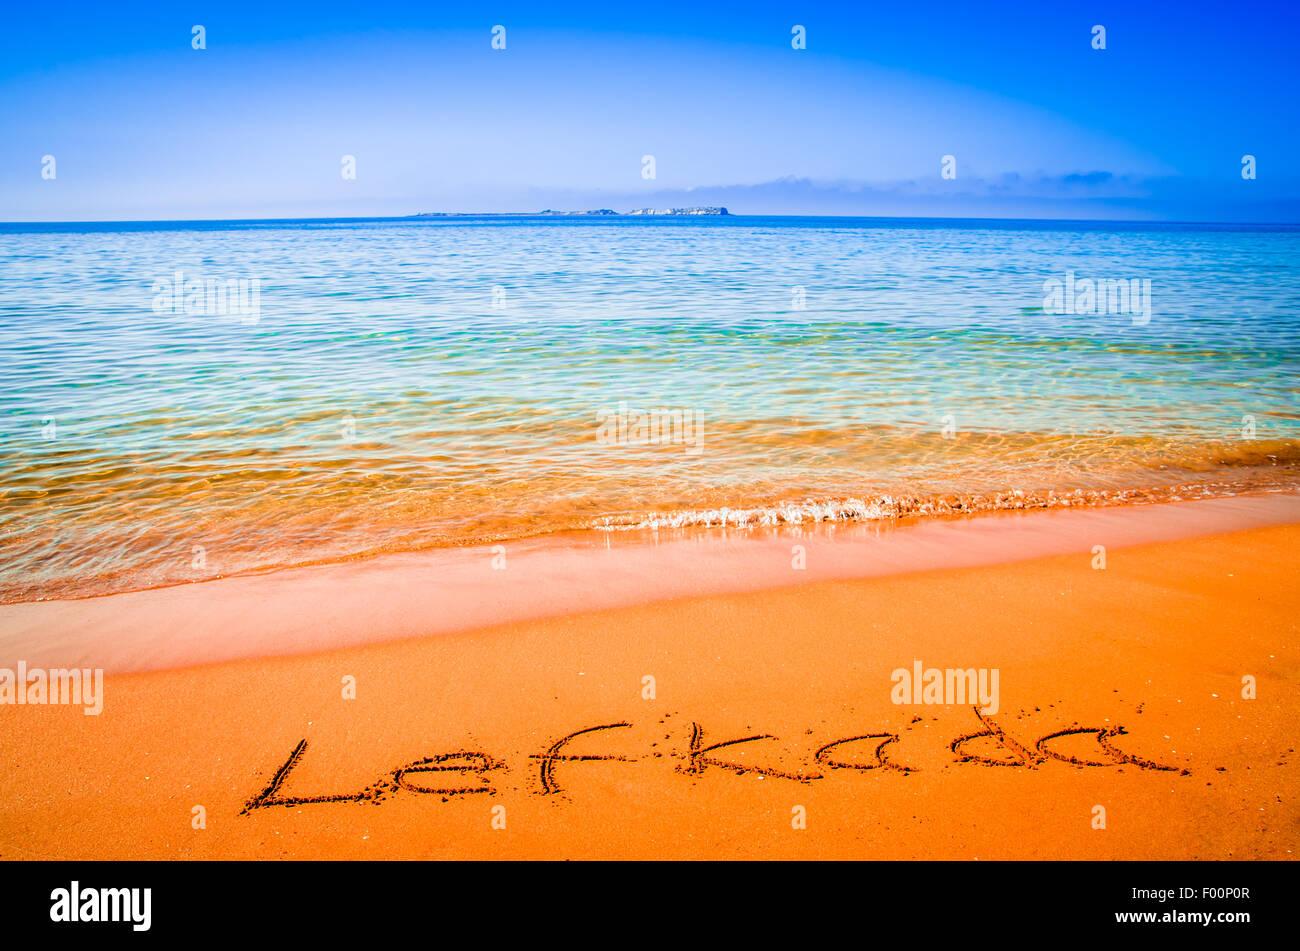 Lefkada word written on a sandy golden beach, Greece. Selective focus. - Stock Image